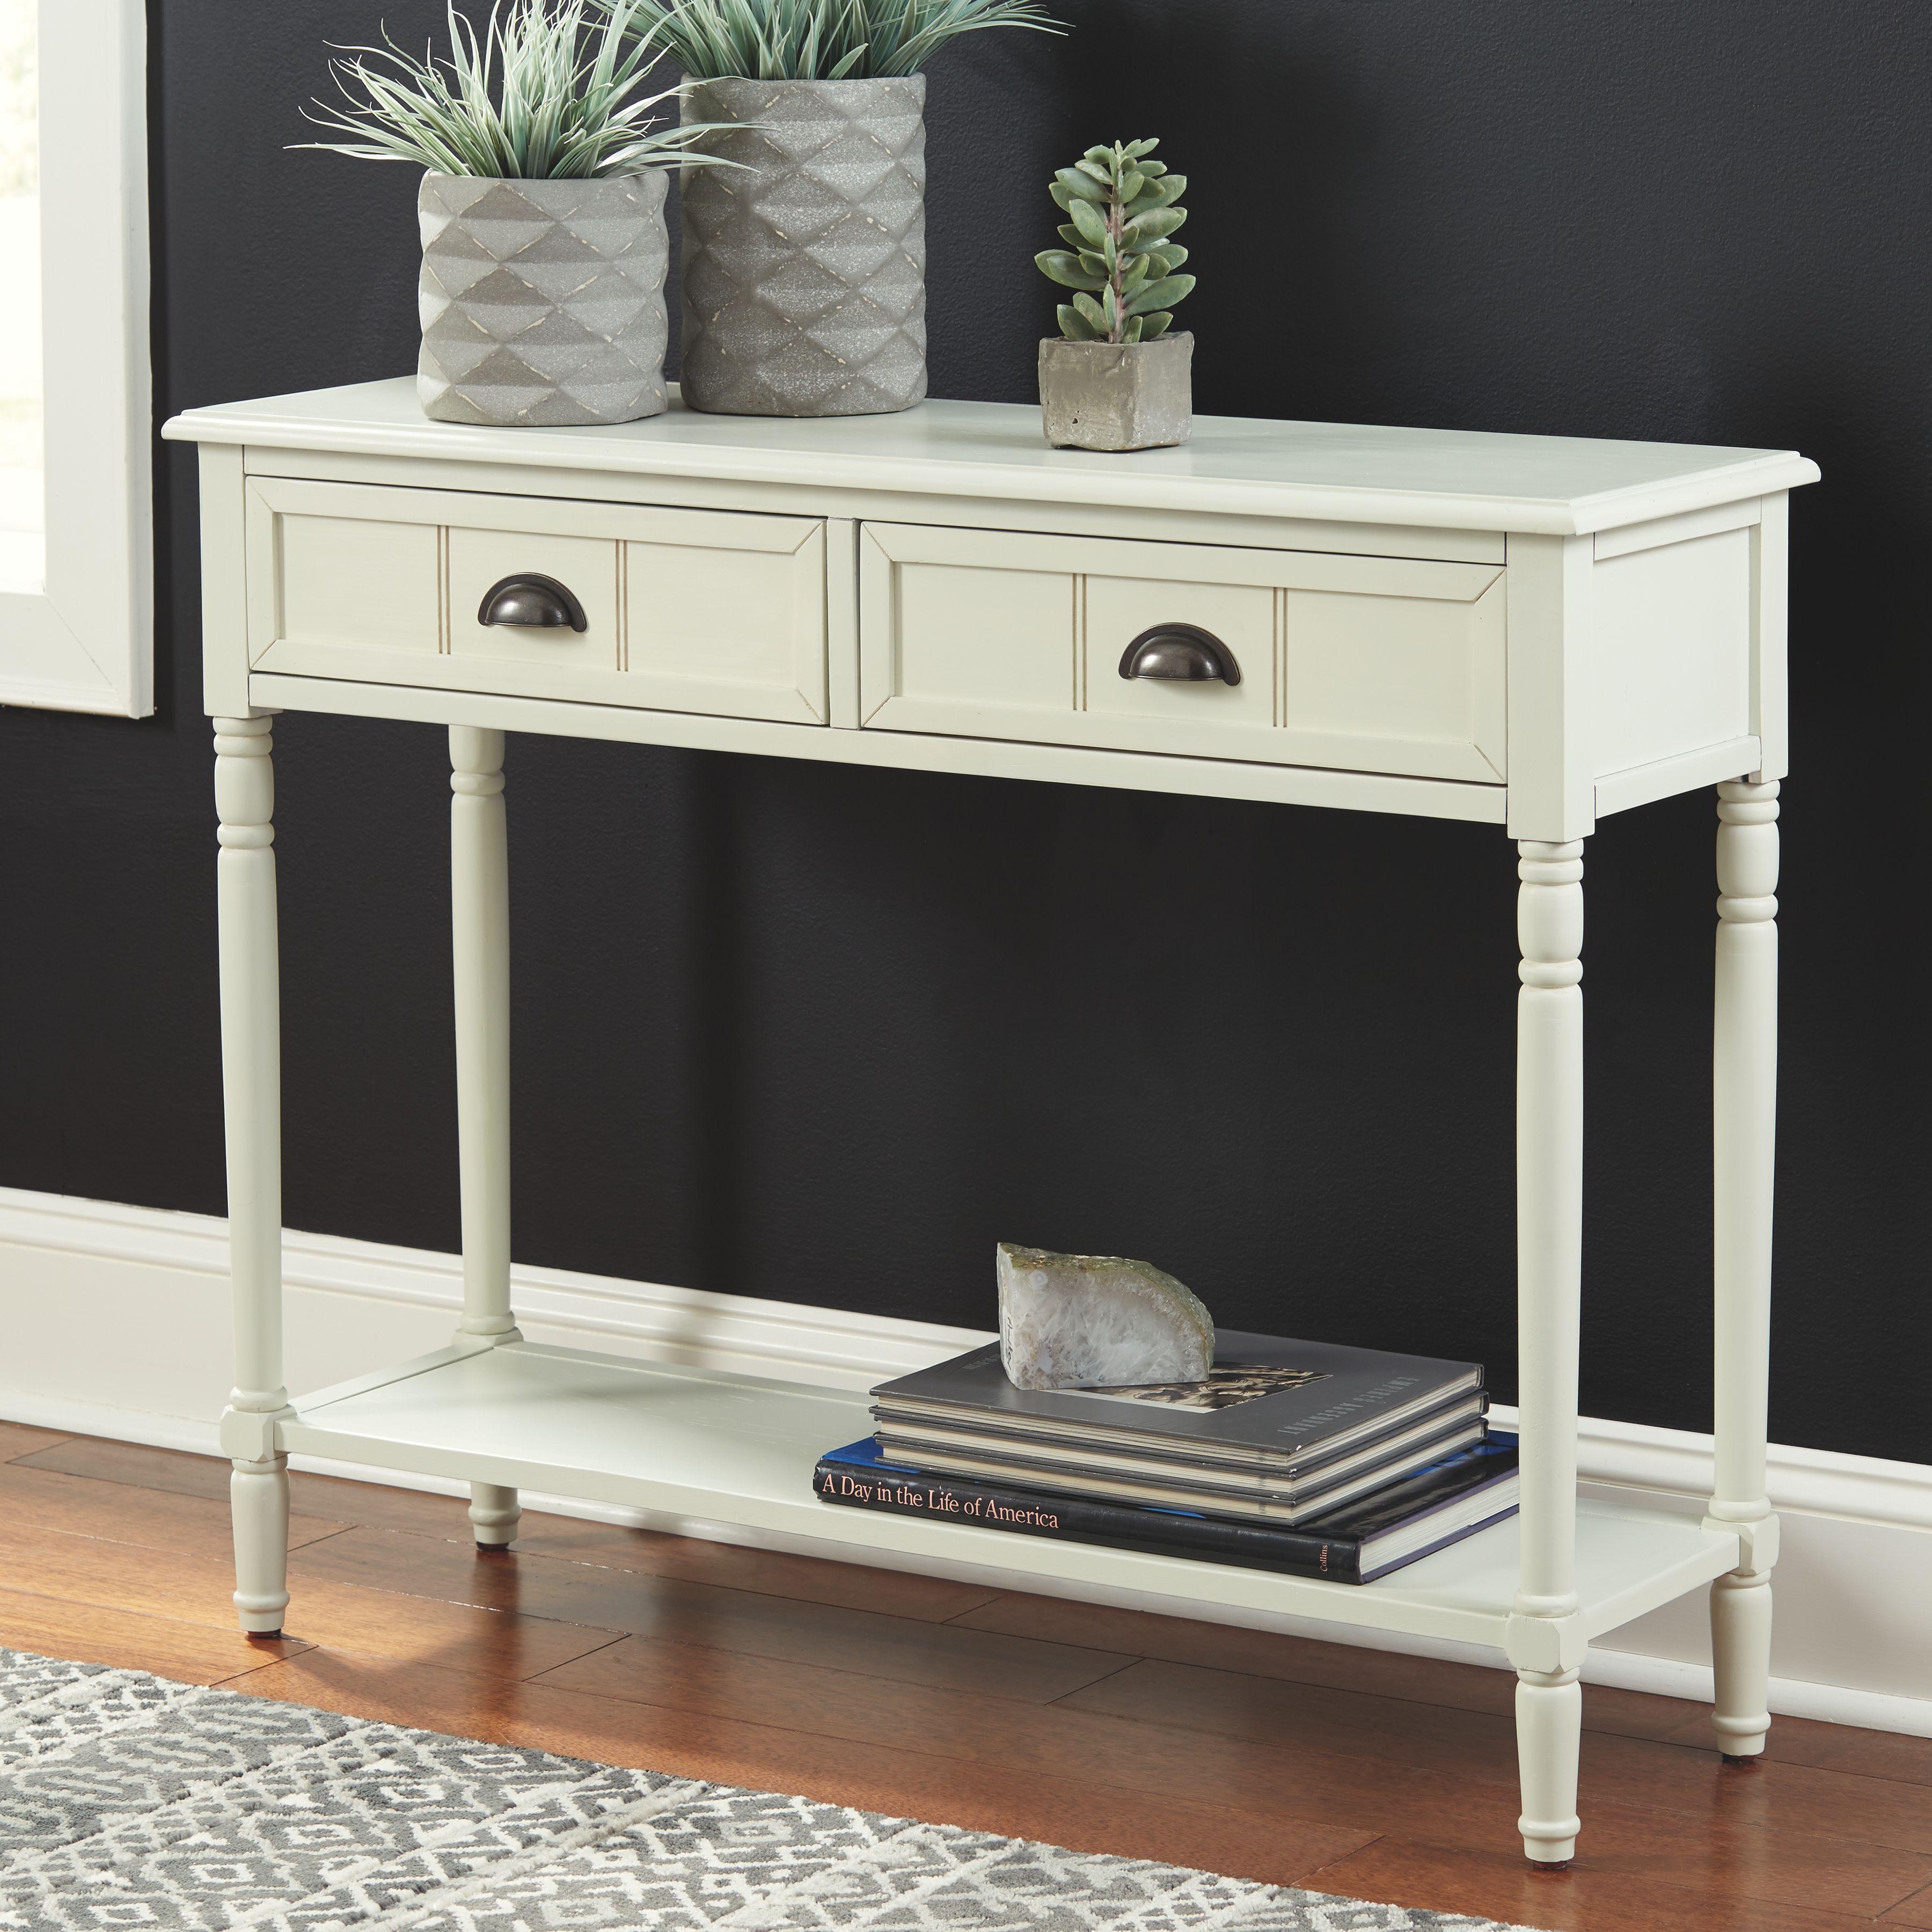 Goverton Sofa Console Table White Console Table Sofa Table